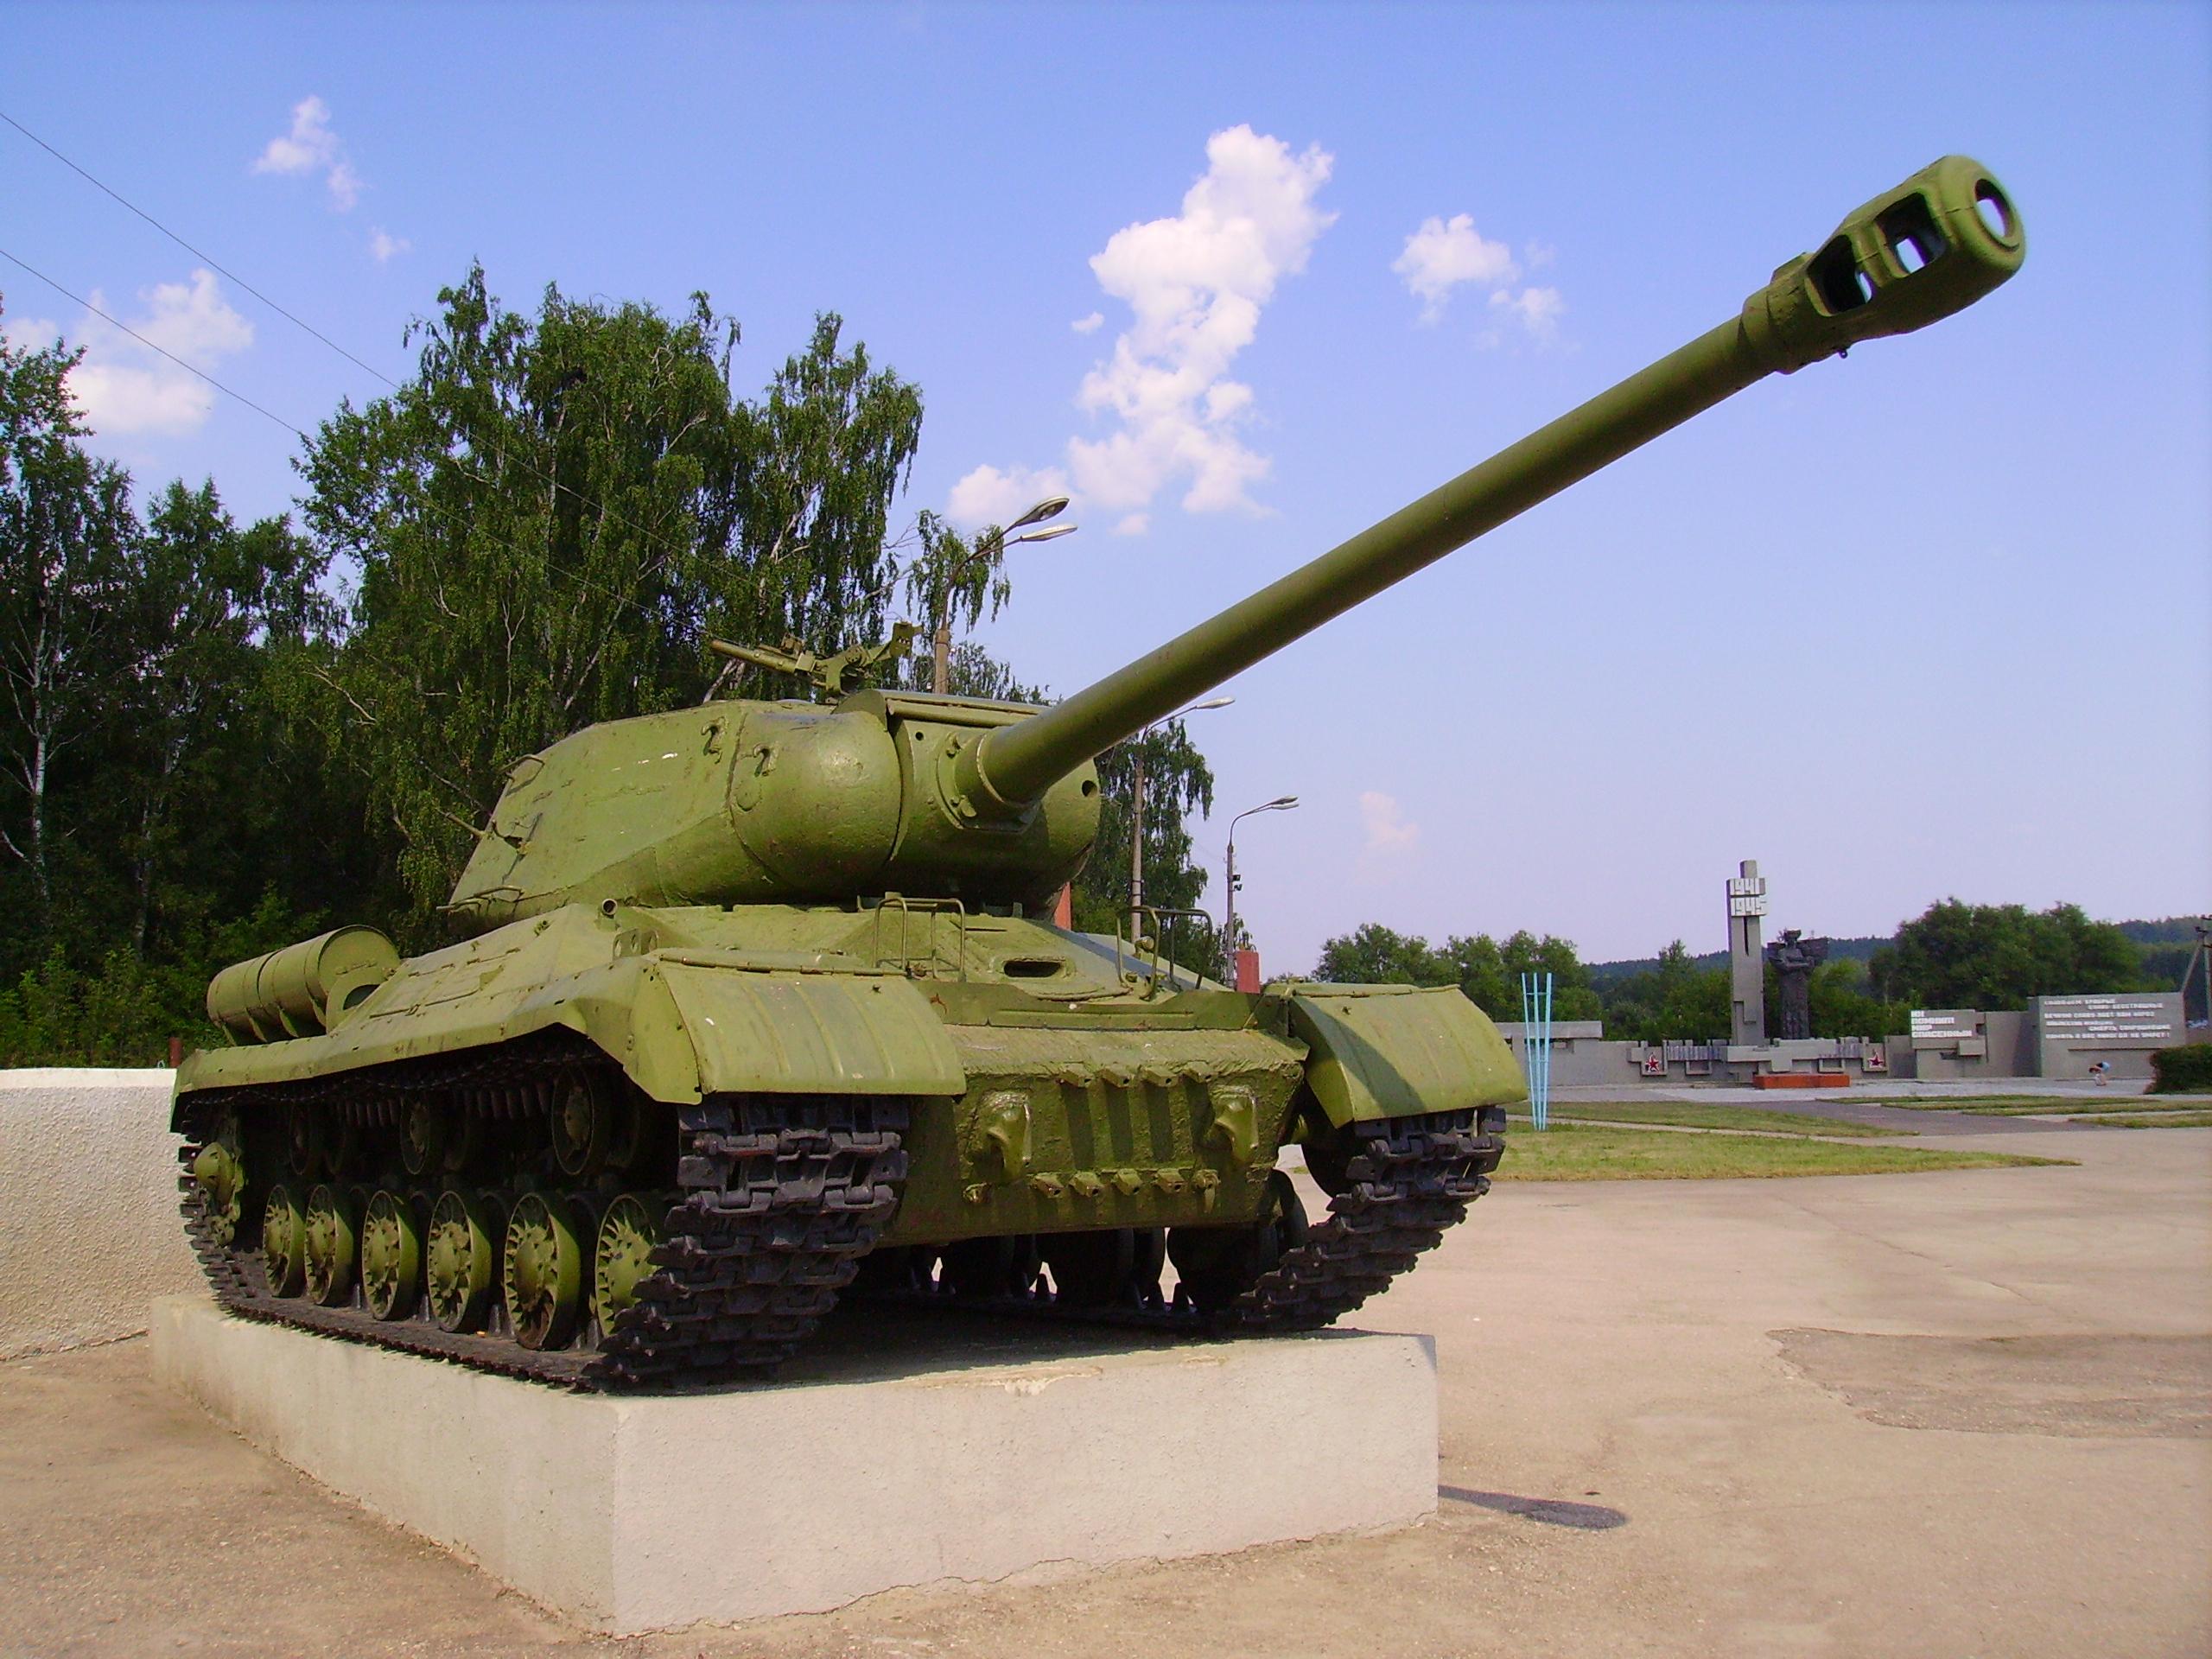 IS-2 tank Monument at WWII Memorial in Shatki.JPG